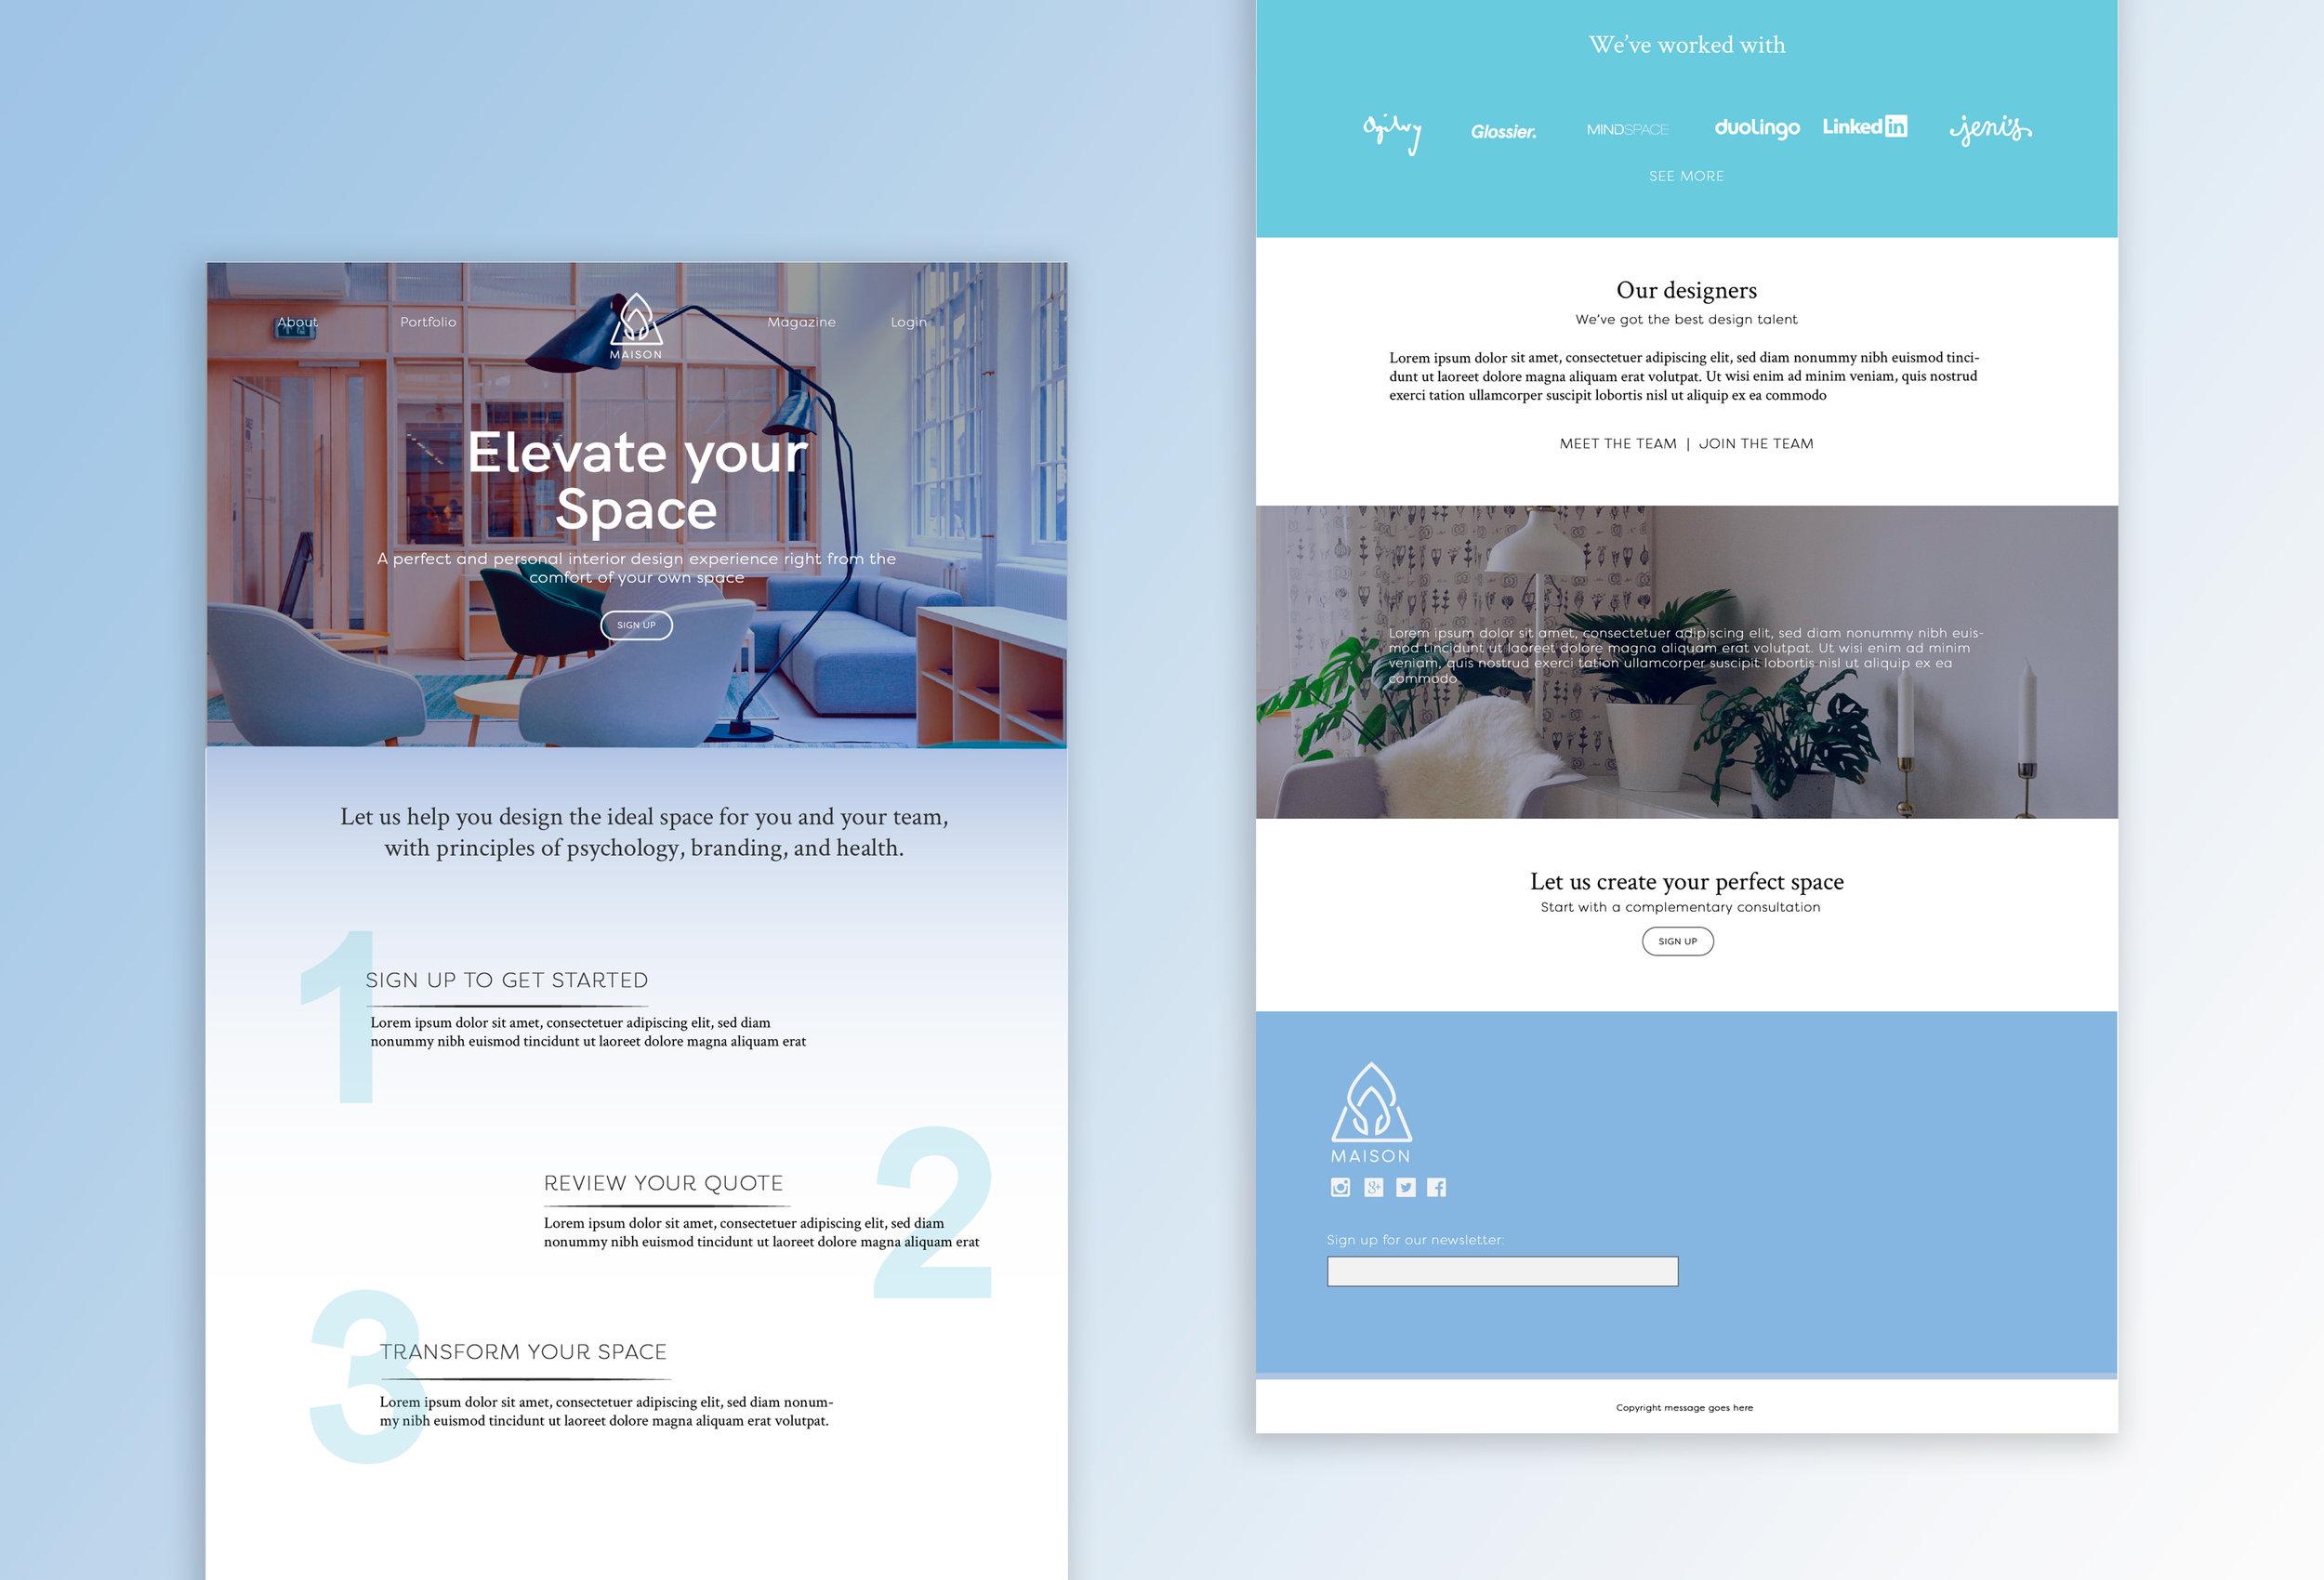 Maison-Web-Showcase-Project-Presentation.jpg